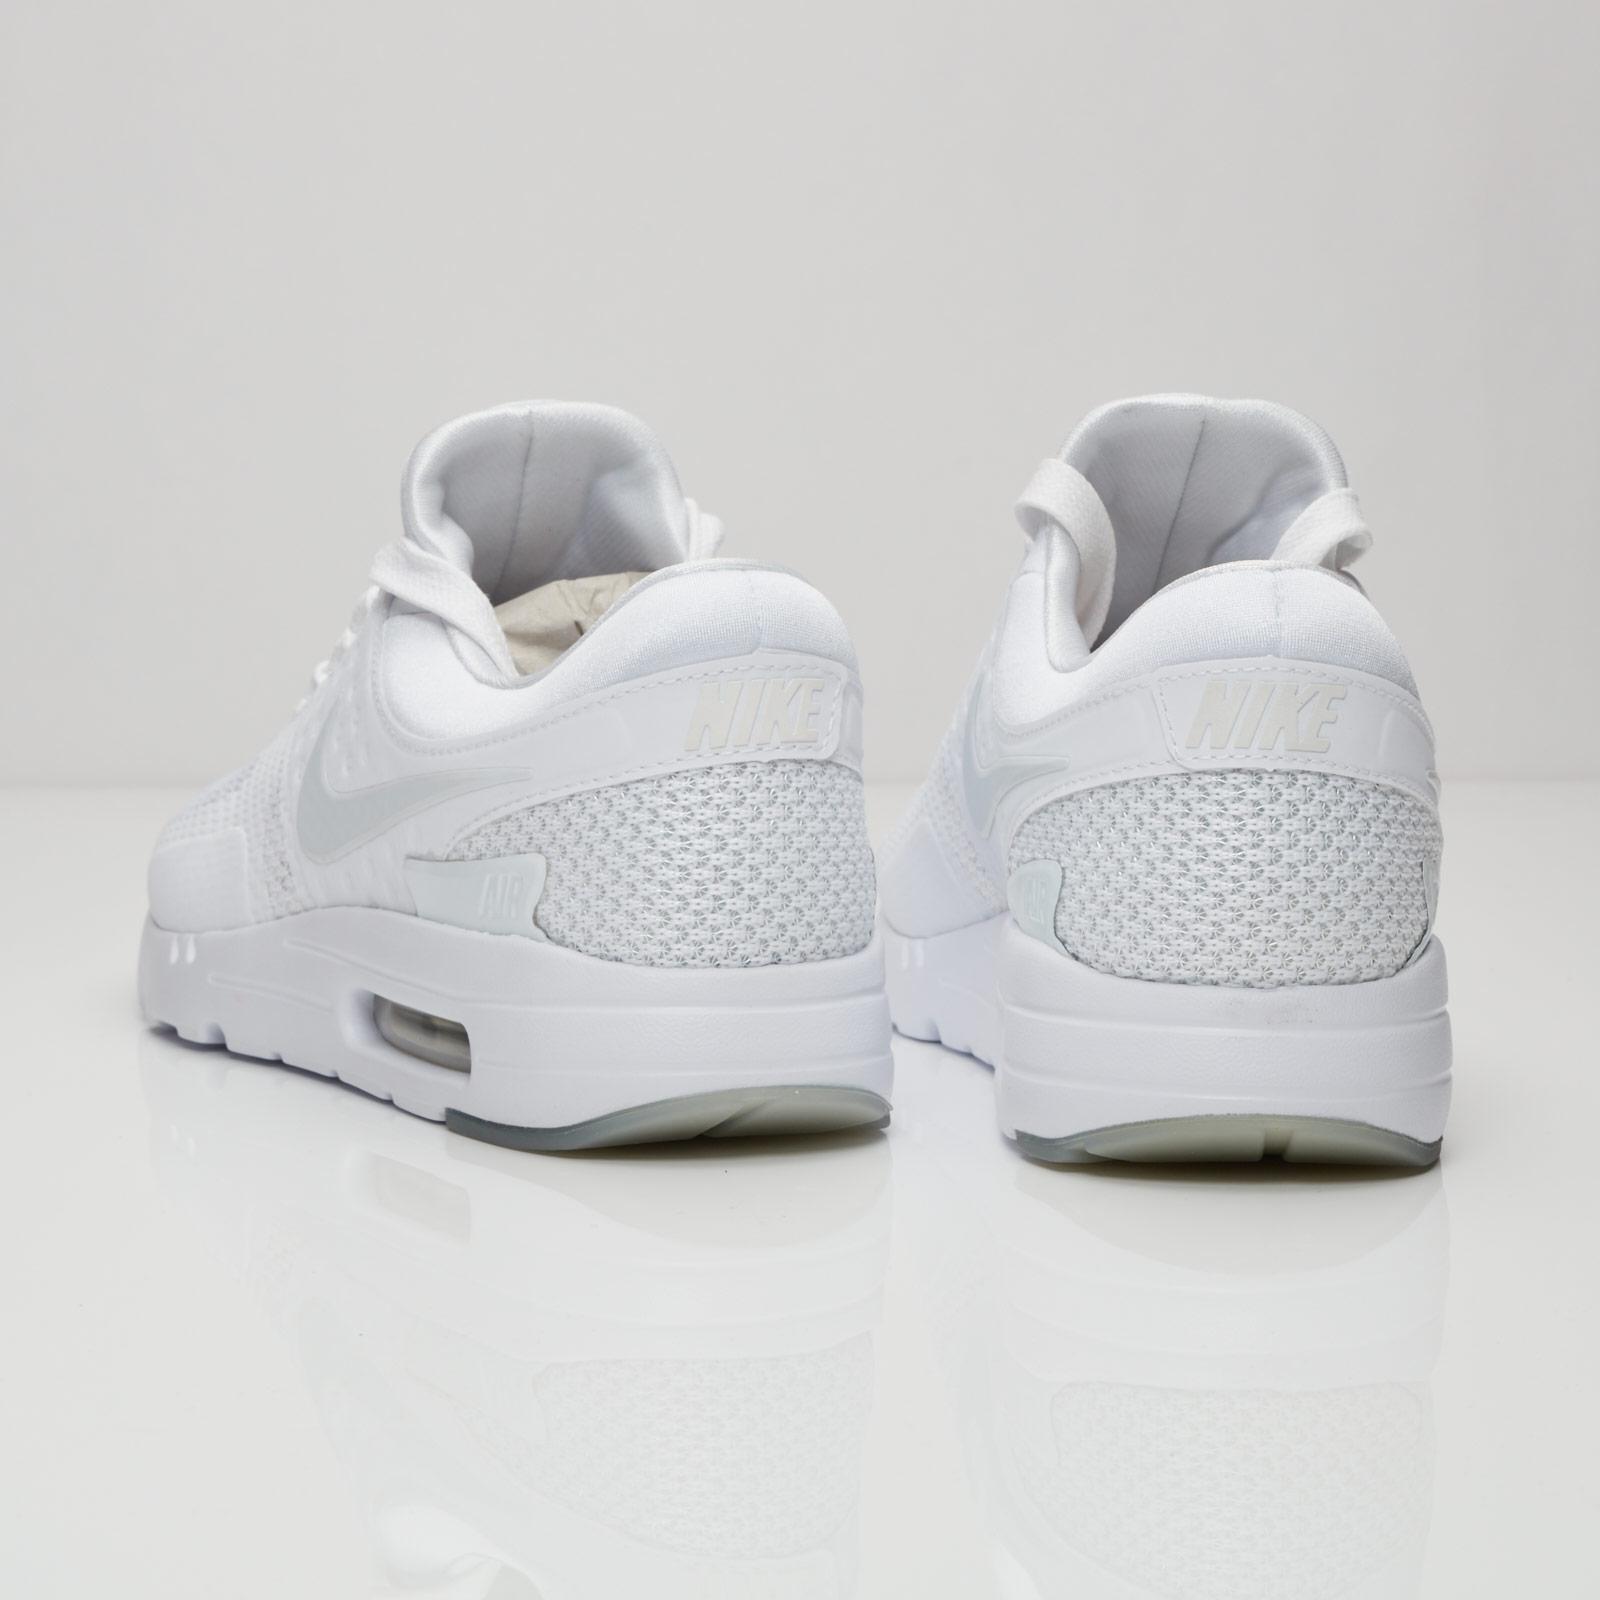 Nike Air Max Zero QS 789695 102 Sneakersnstuff